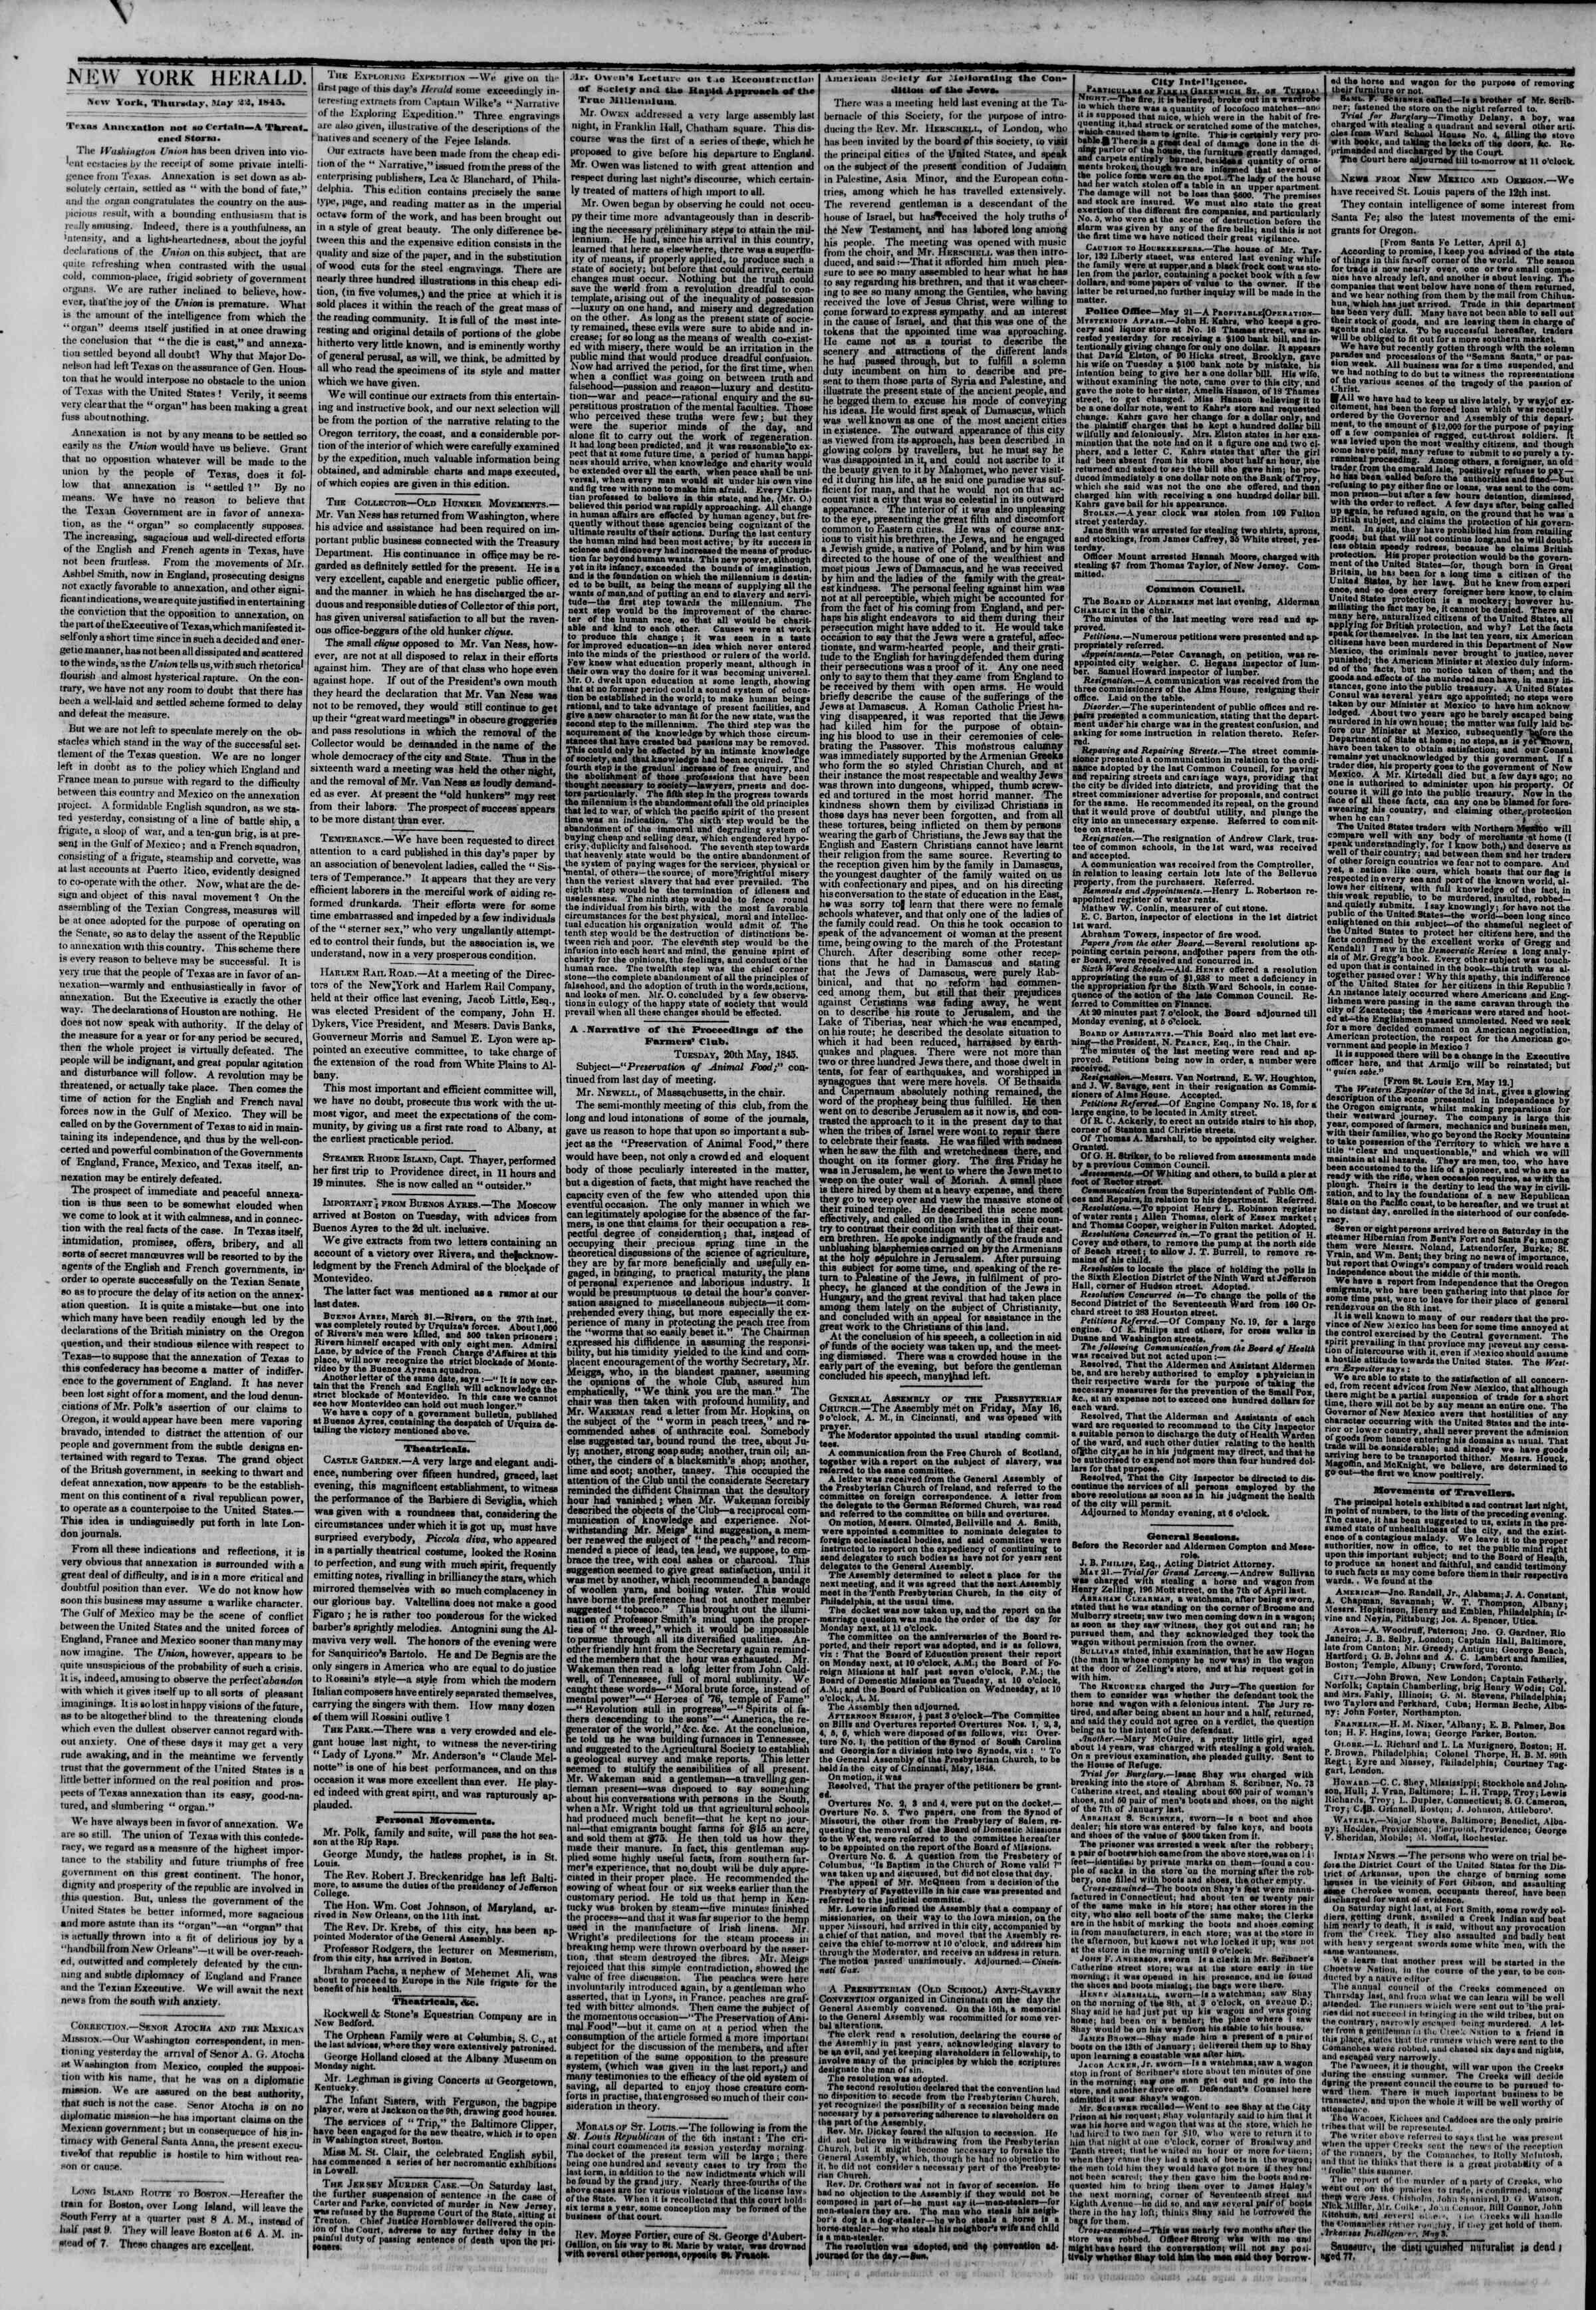 May 22, 1845 Tarihli The New York Herald Gazetesi Sayfa 2